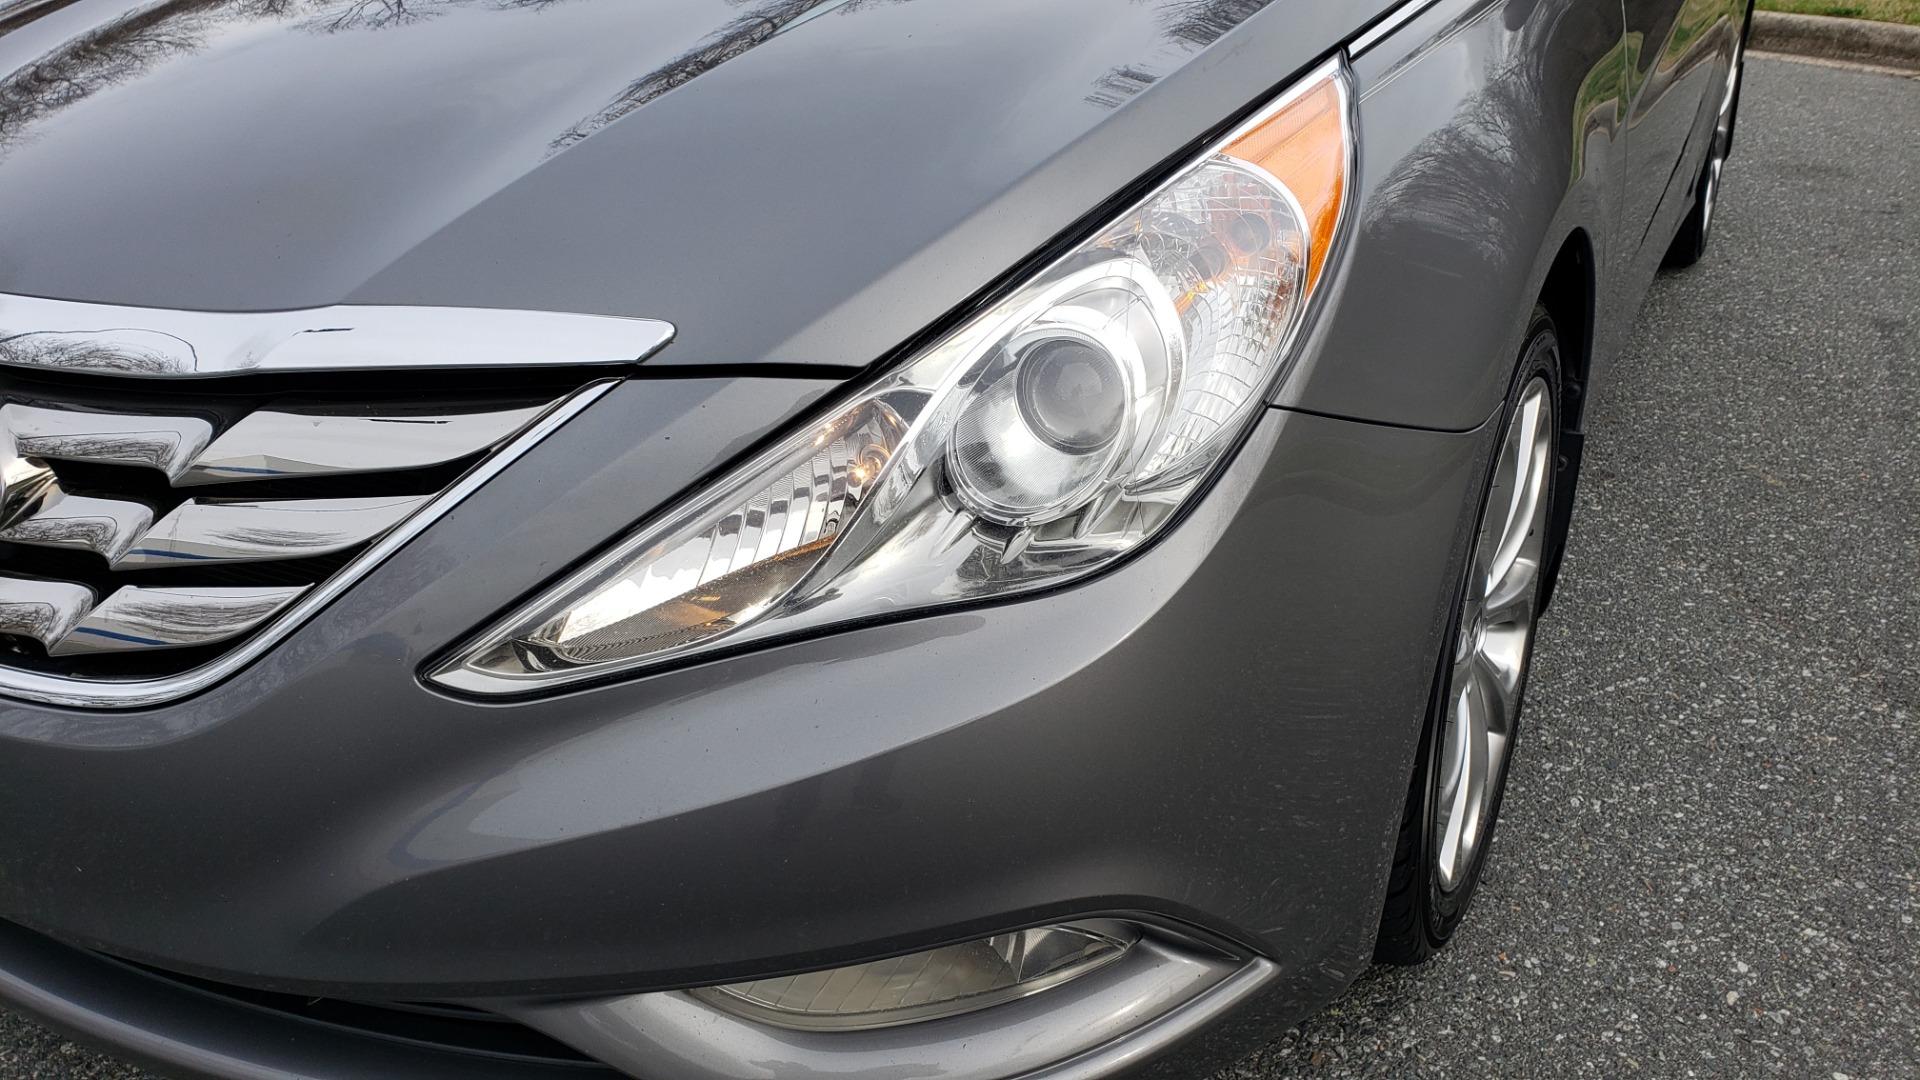 Used 2013 Hyundai SONATA SE AUTO / 2.4L 4-CYL / 6-SPD AUTO / VERY CLEAN for sale Sold at Formula Imports in Charlotte NC 28227 25